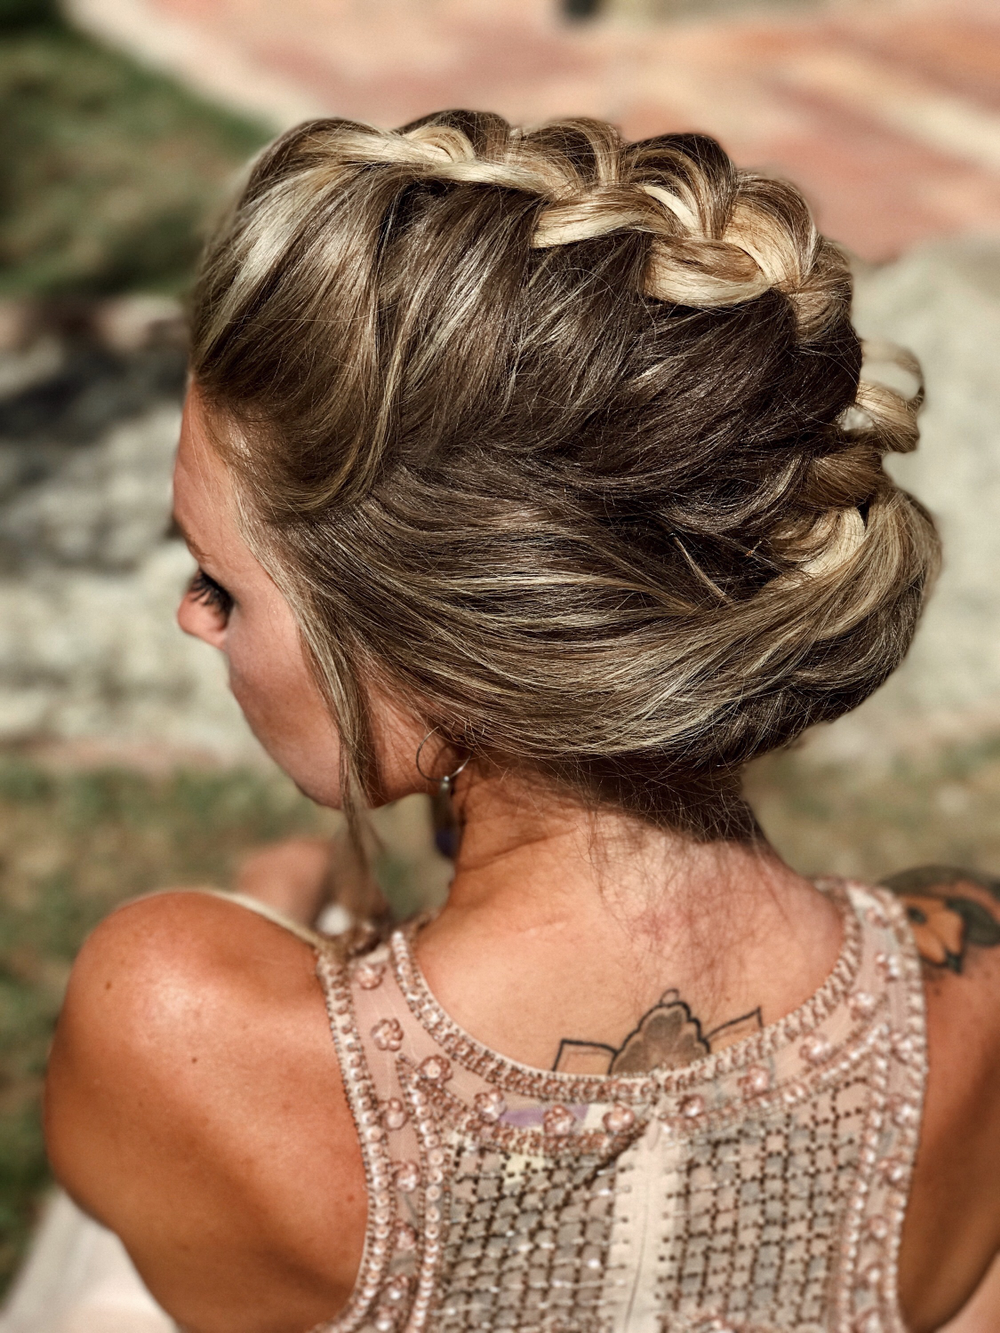 Jessica Bartolucci @salon.187